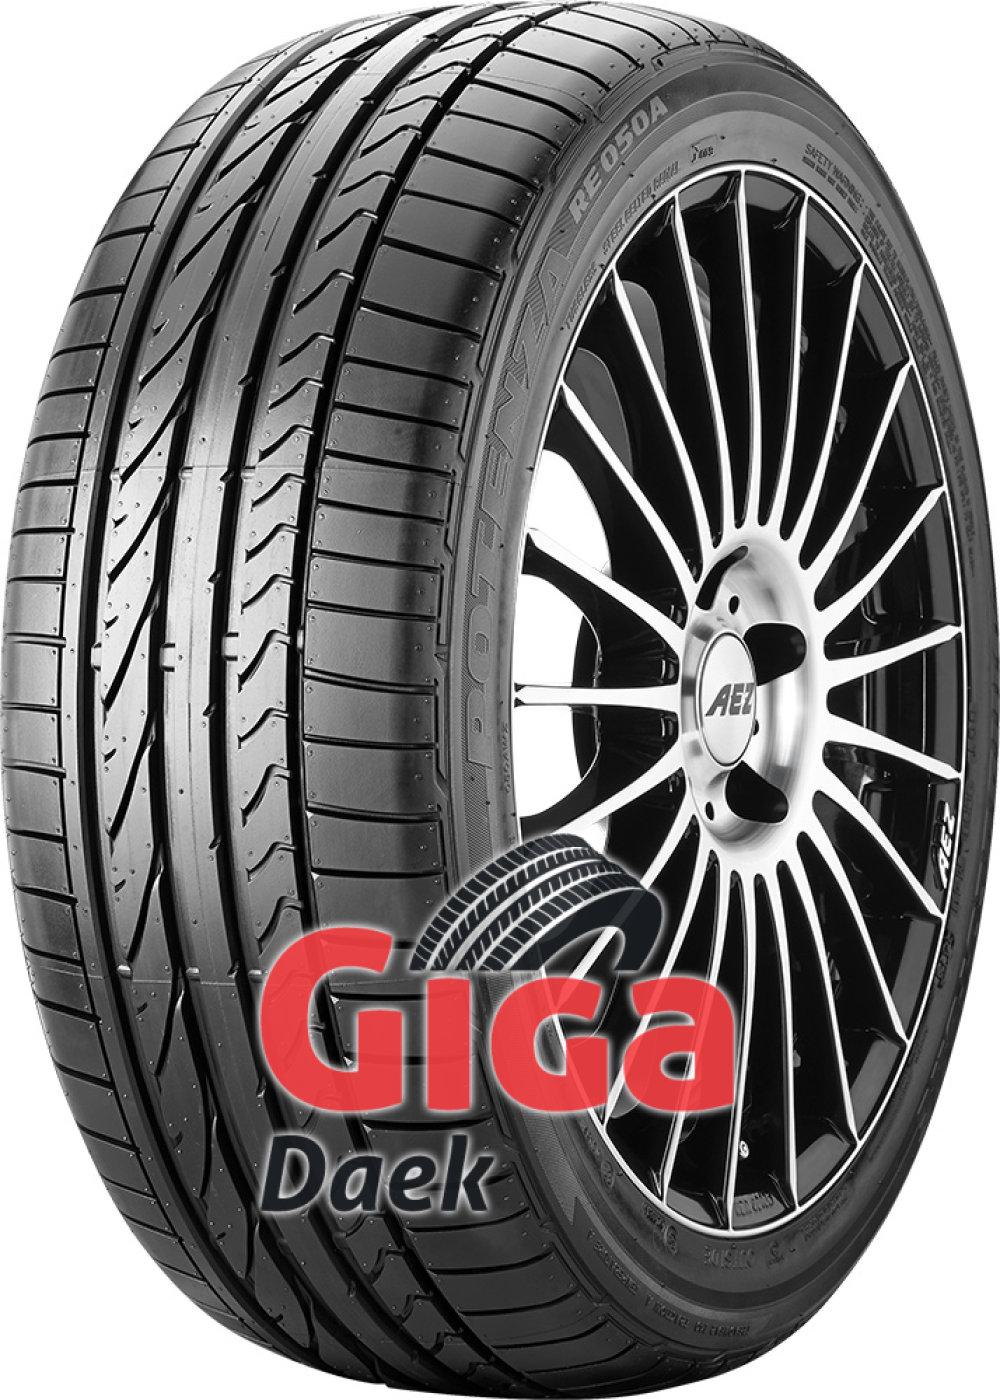 Bridgestone Potenza RE 050 A ( 225/50 R17 94V med fælgbeskyttelse (MFS) )